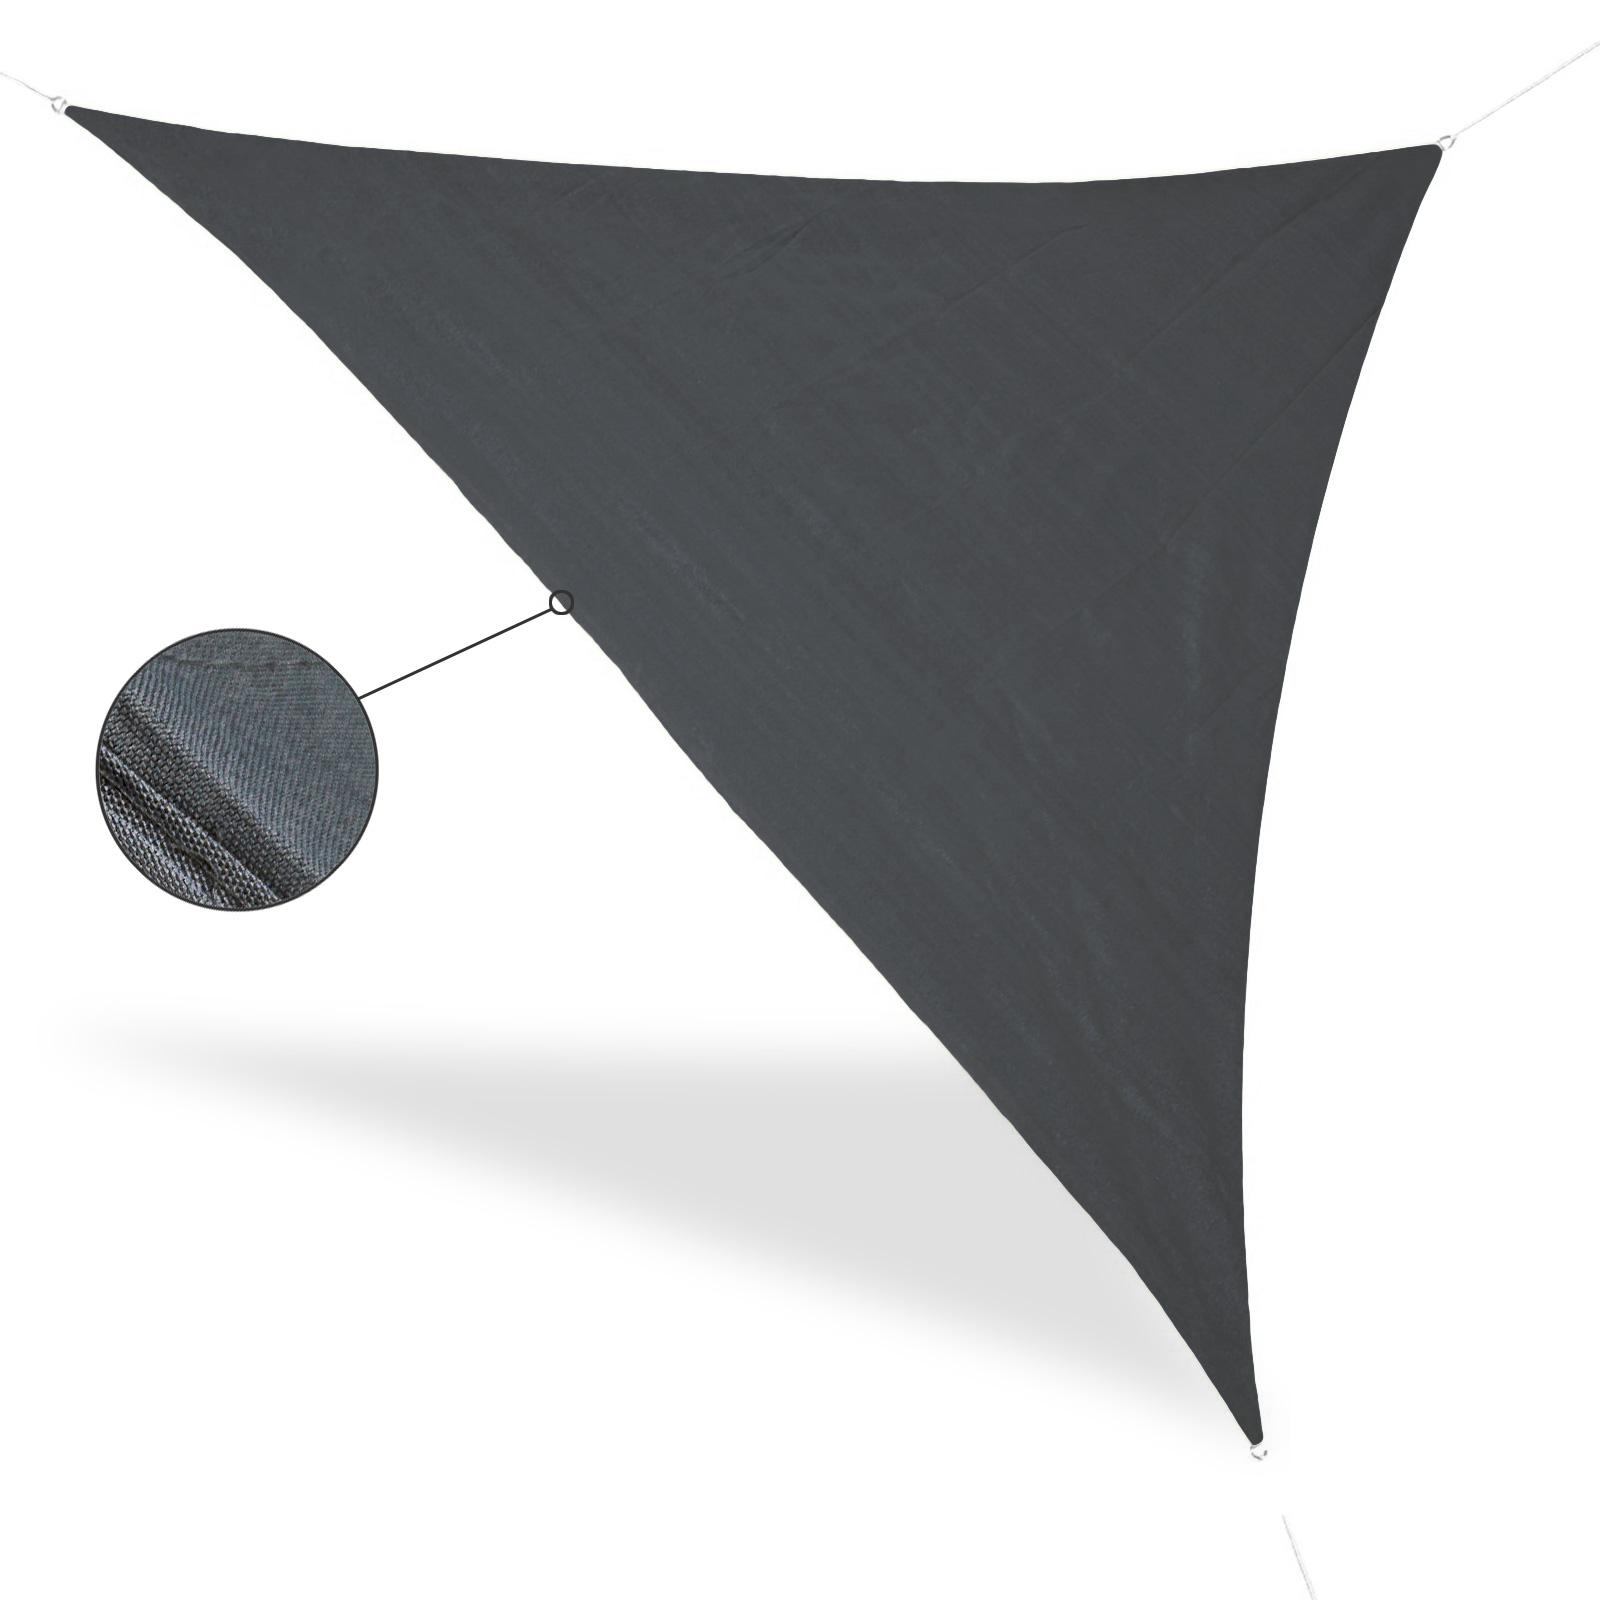 Sonnensegel Dreieck Grau 3,6 x 3,6 x 3,6 m, Metallringe, Abspannleinen